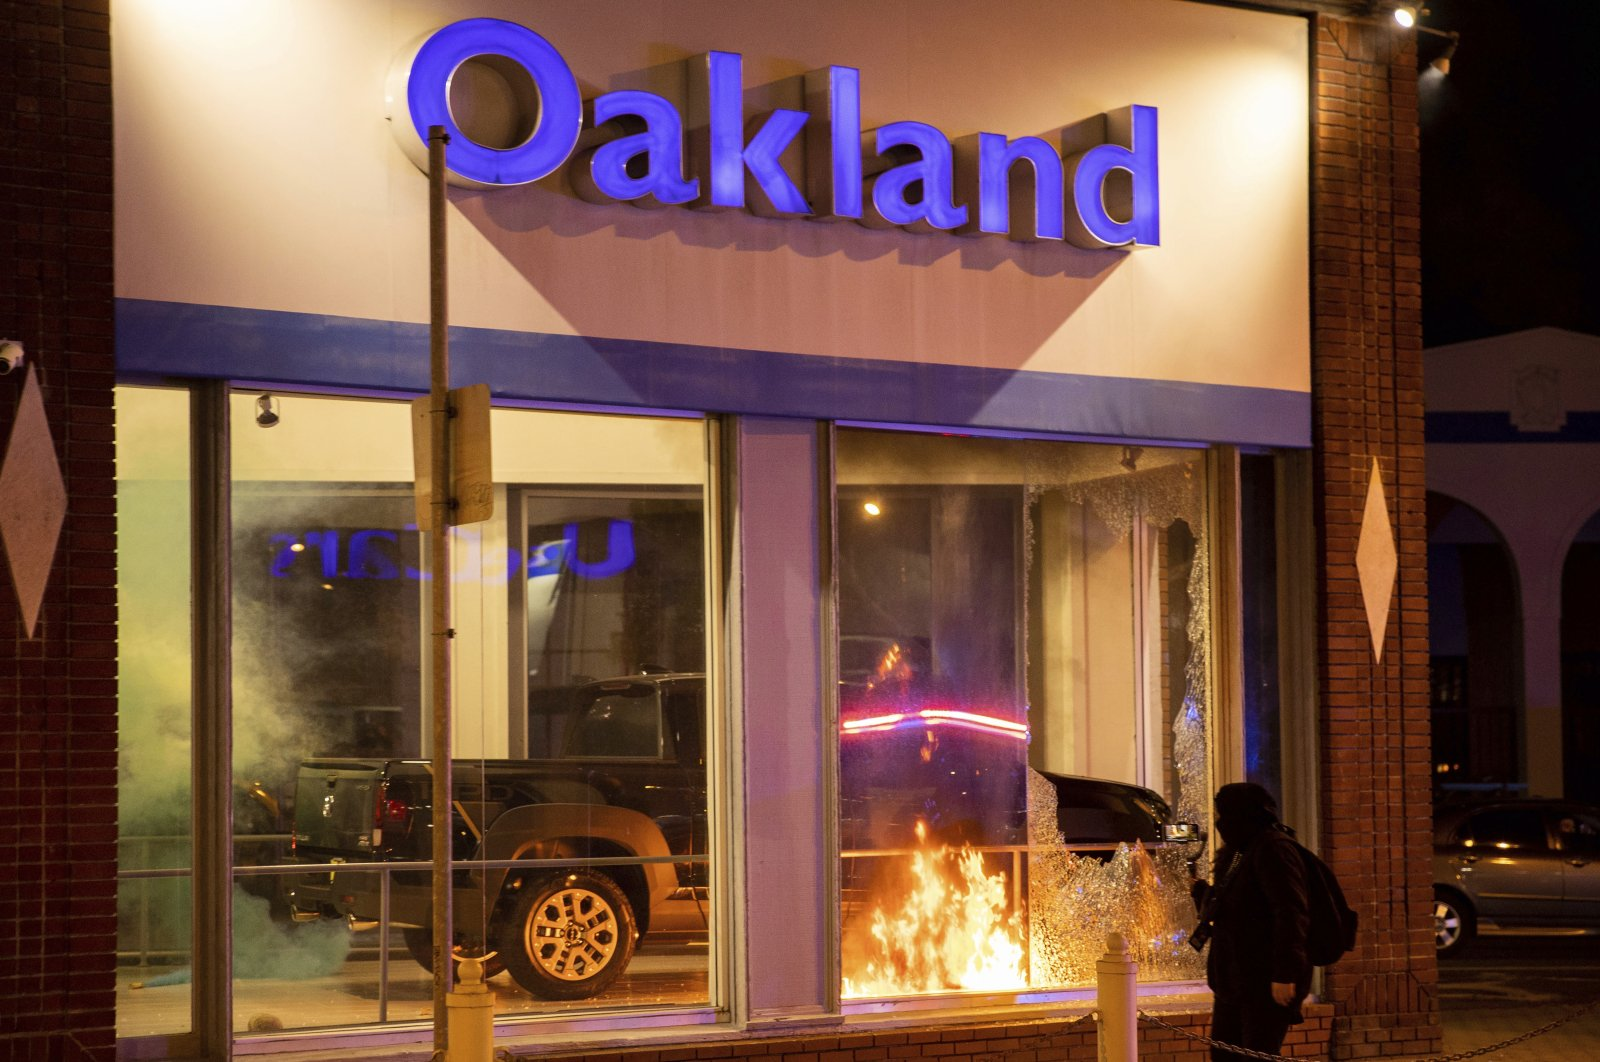 Demonstrators set fires at a Honda dealership during a protest against police brutality in Oakland, California, U.S., April 16, 2021. (AP Photo)